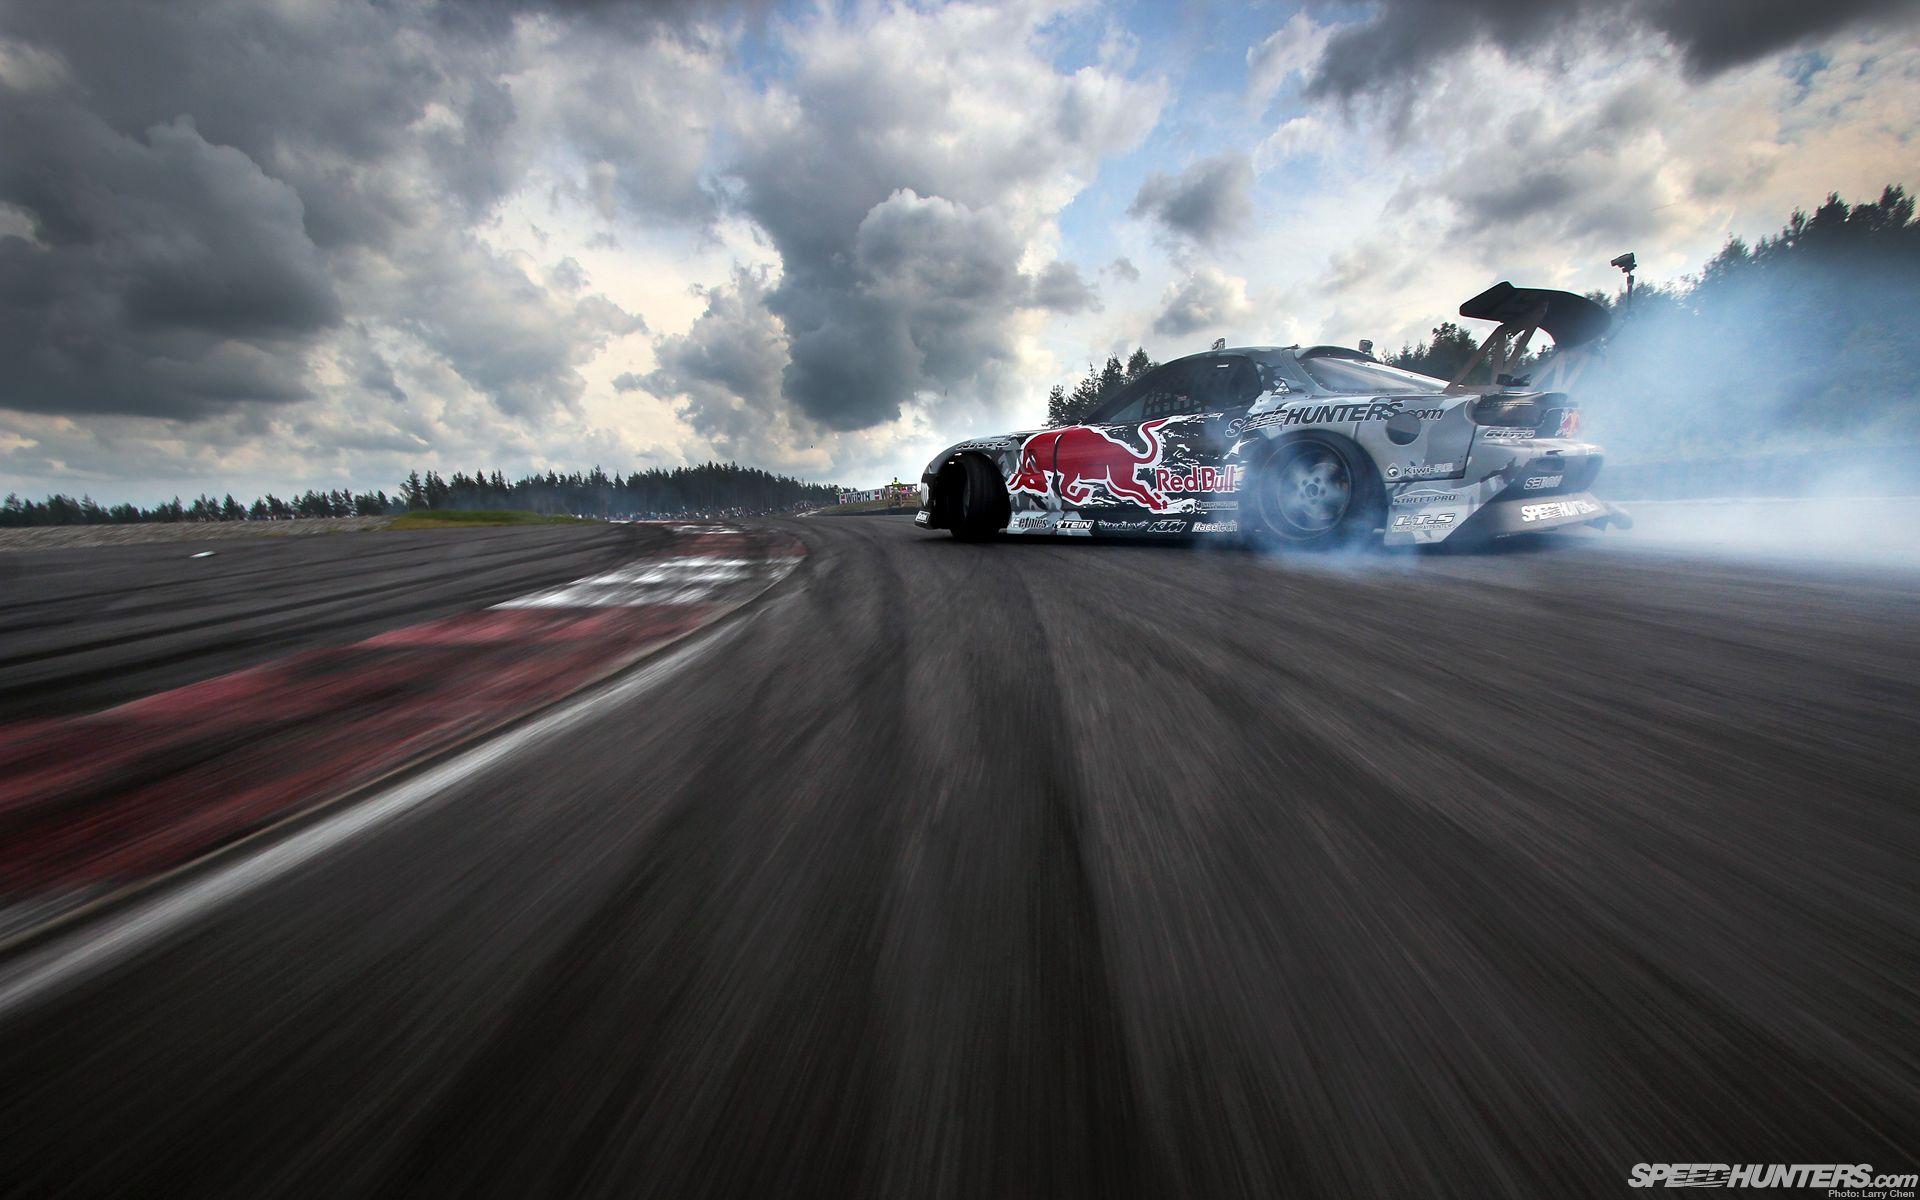 Chasing The Perfect Image Car Wallpapers Drifting Cars Mazda Rx7